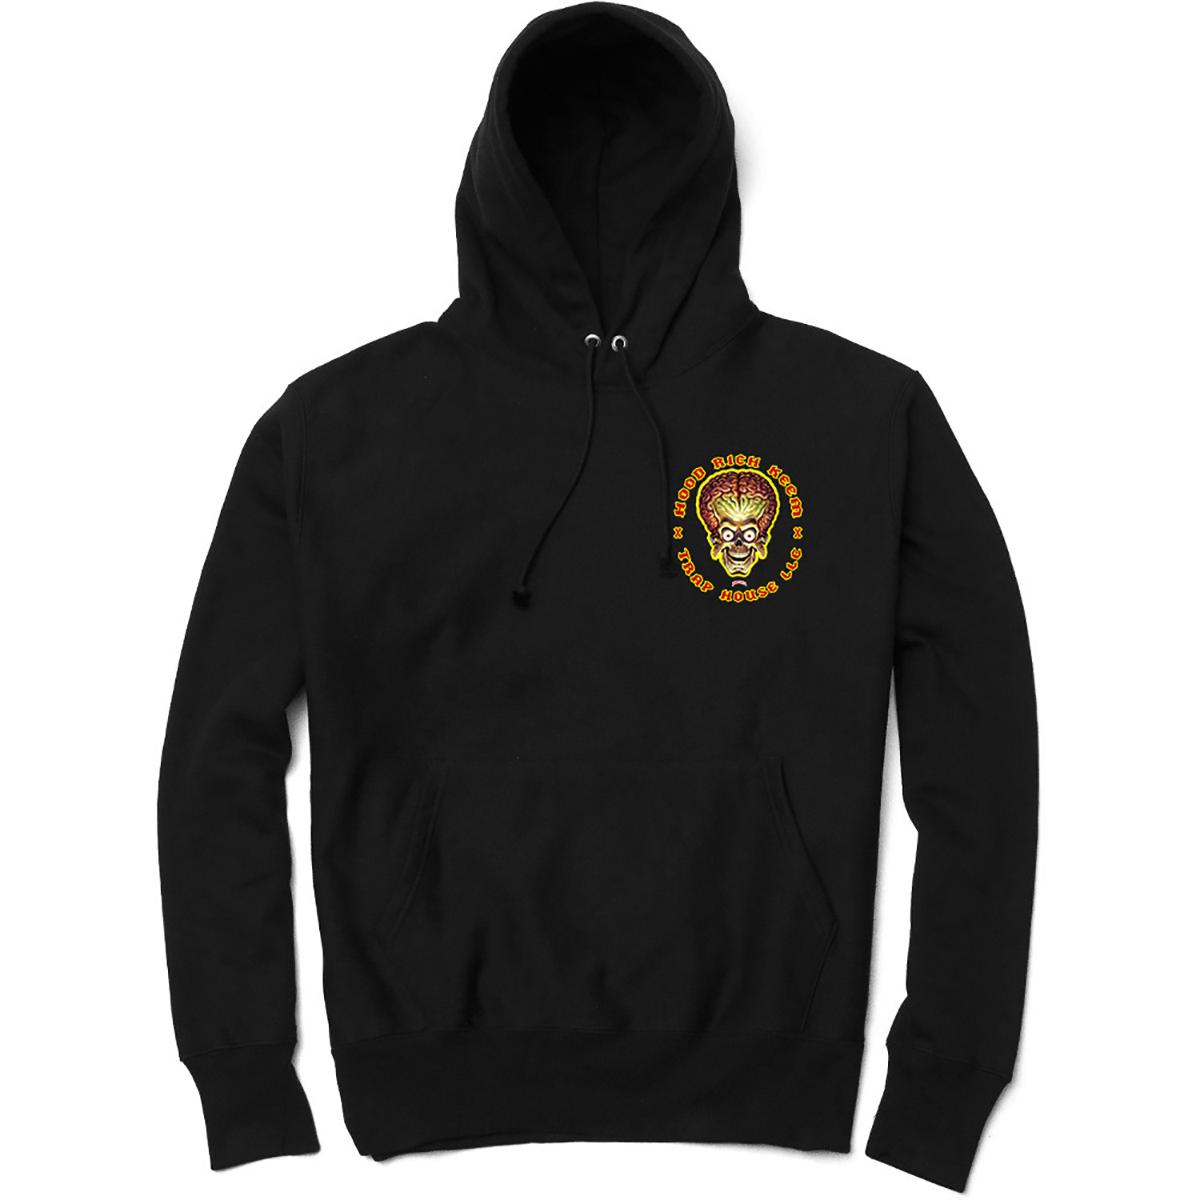 Trap House Hooded Sweatshirt